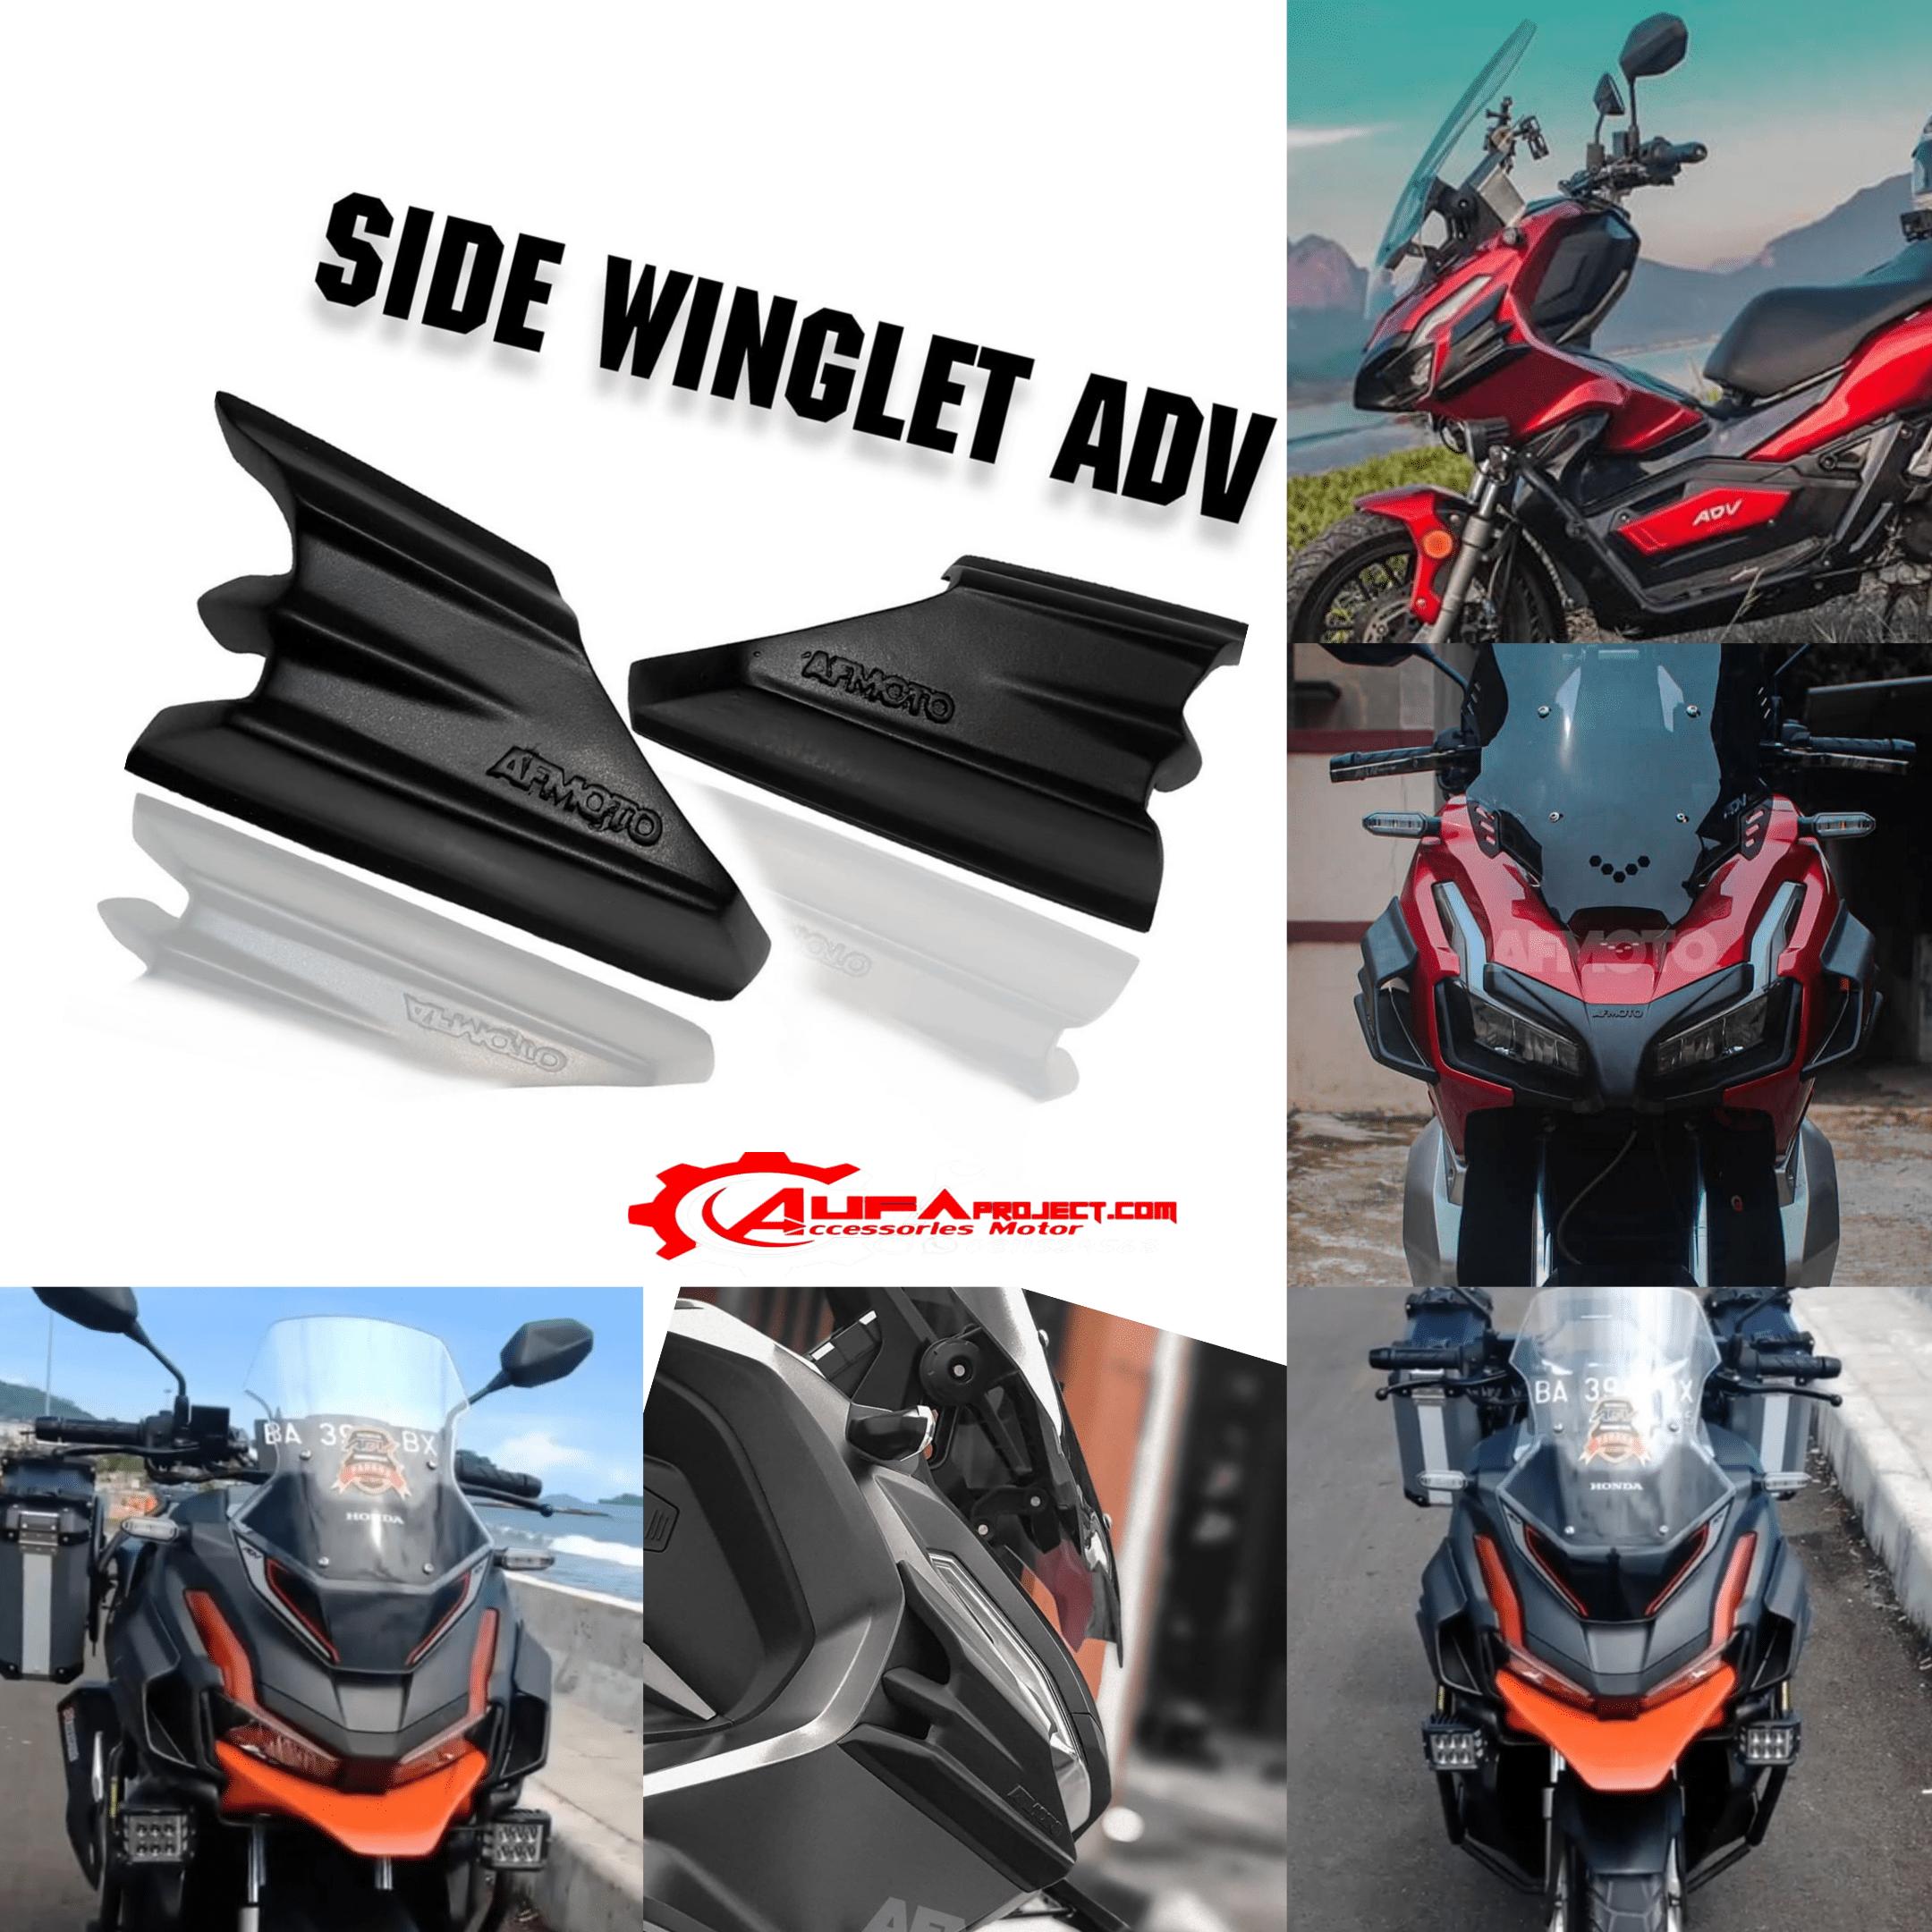 Side Winglet Honda Adv Aksesoris Honda Adv 150 Aufaproject46 Com